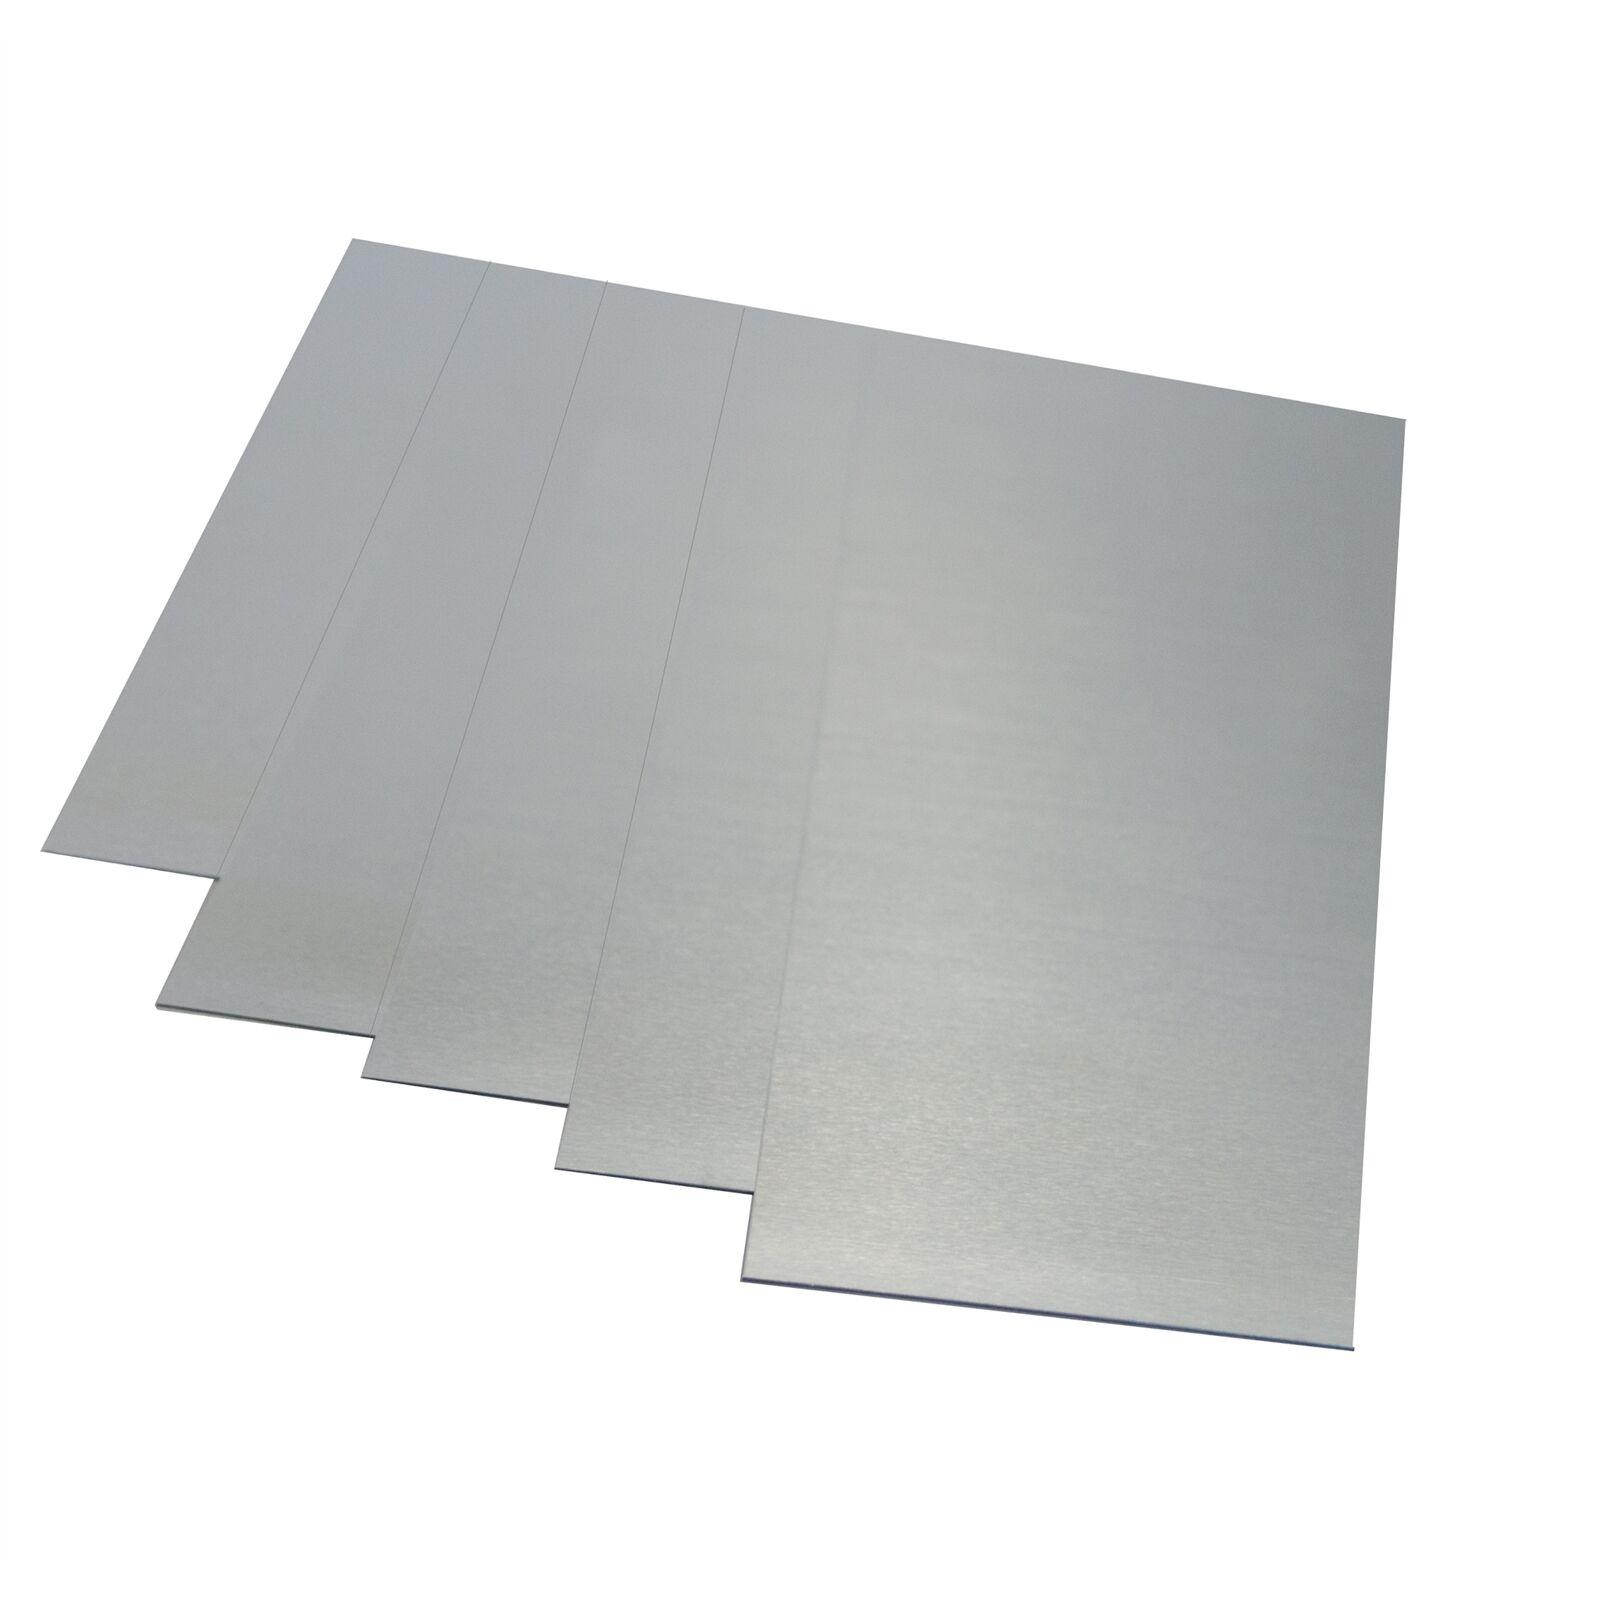 Metal Mate ALUMINIUM FLAT SHEET Aust Brand- 0.5x300, 0.5x600 Or 0.5x900 x900mm